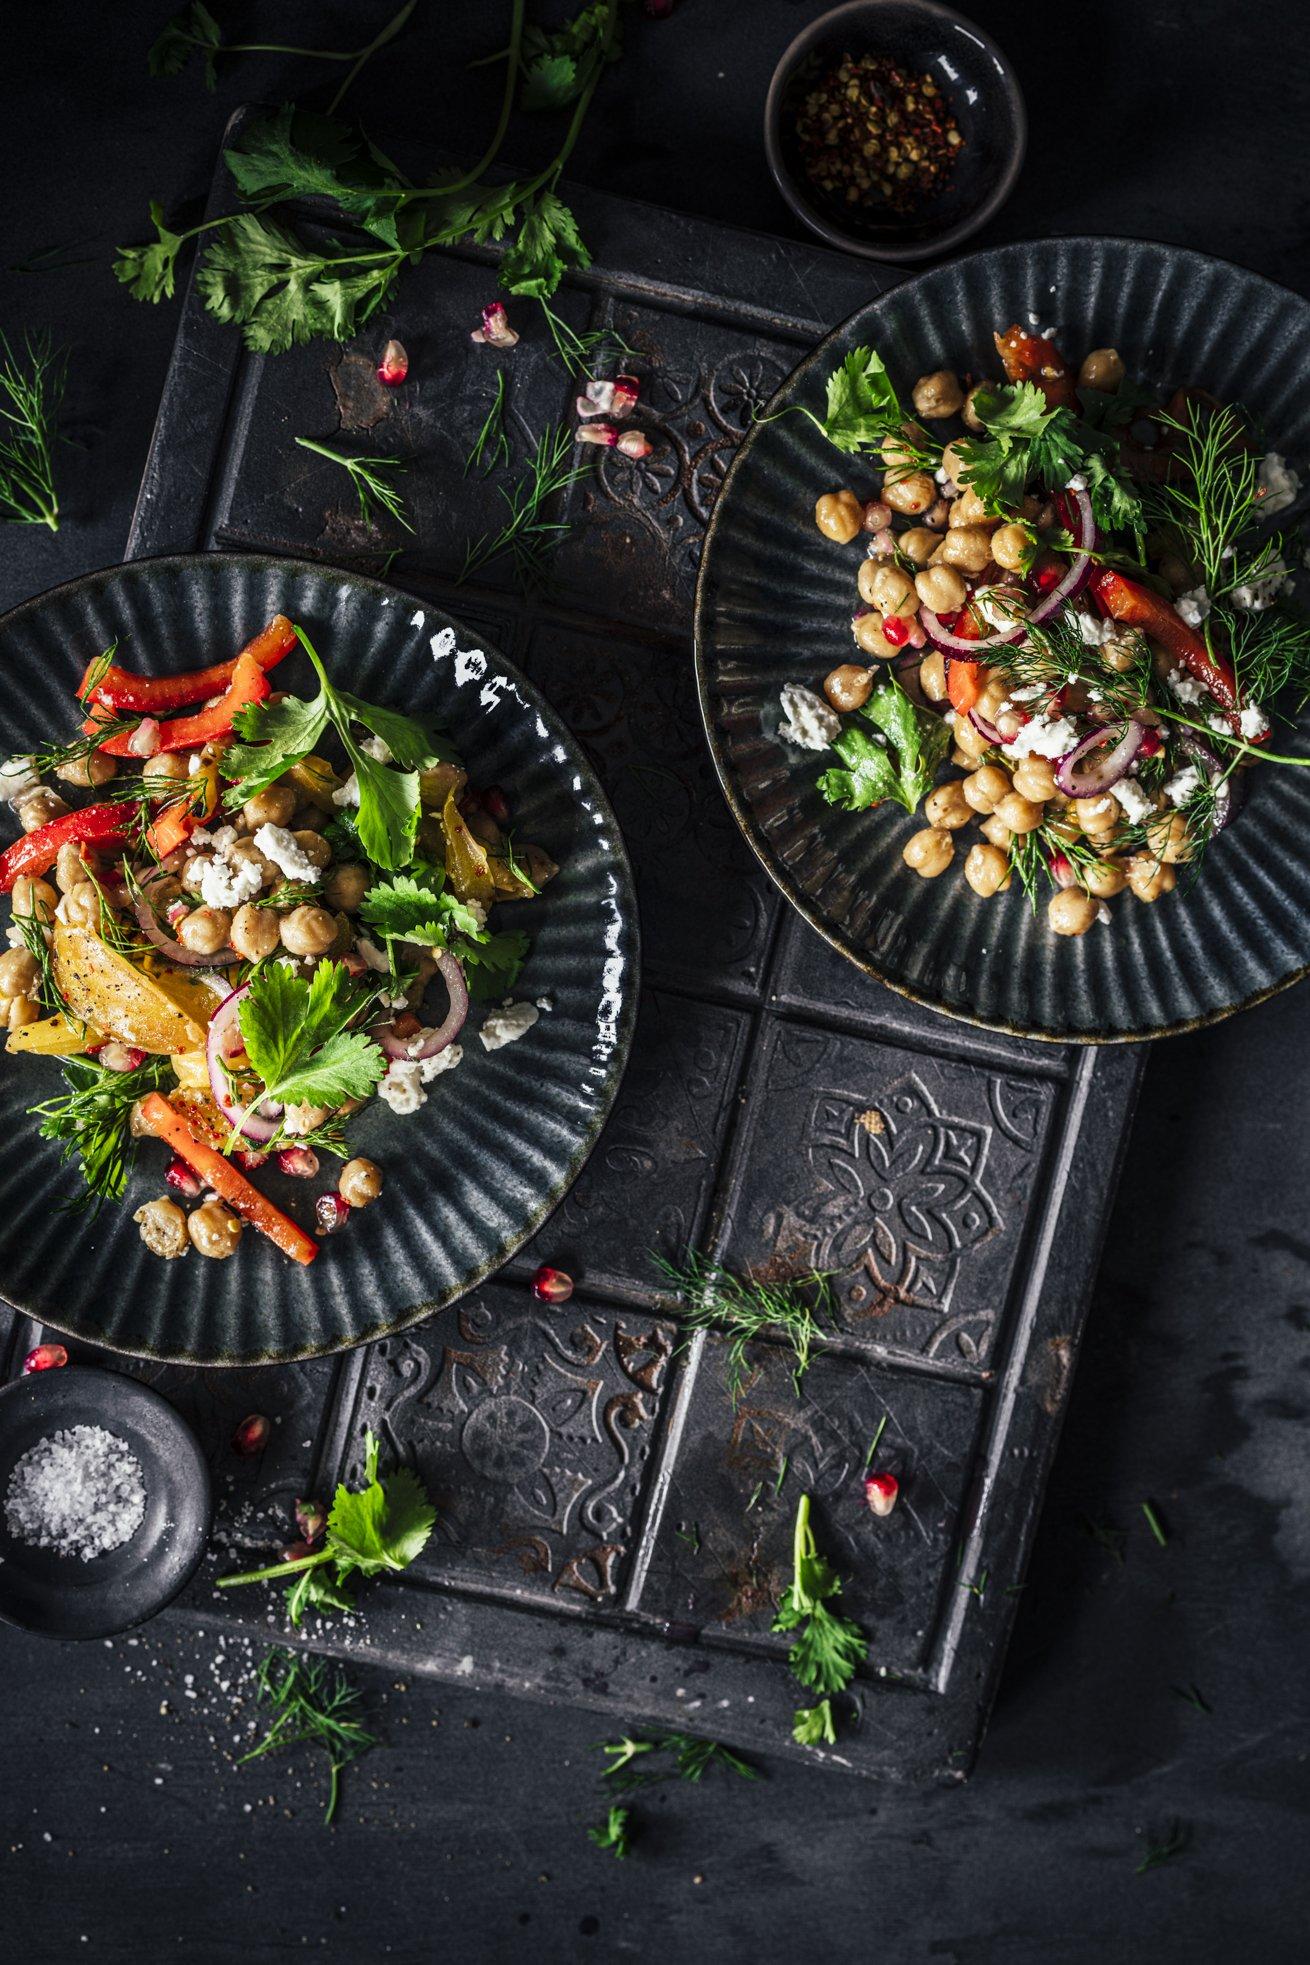 Perfekter Sommersalat. Kichererbsensalat mit Feta und Paprika